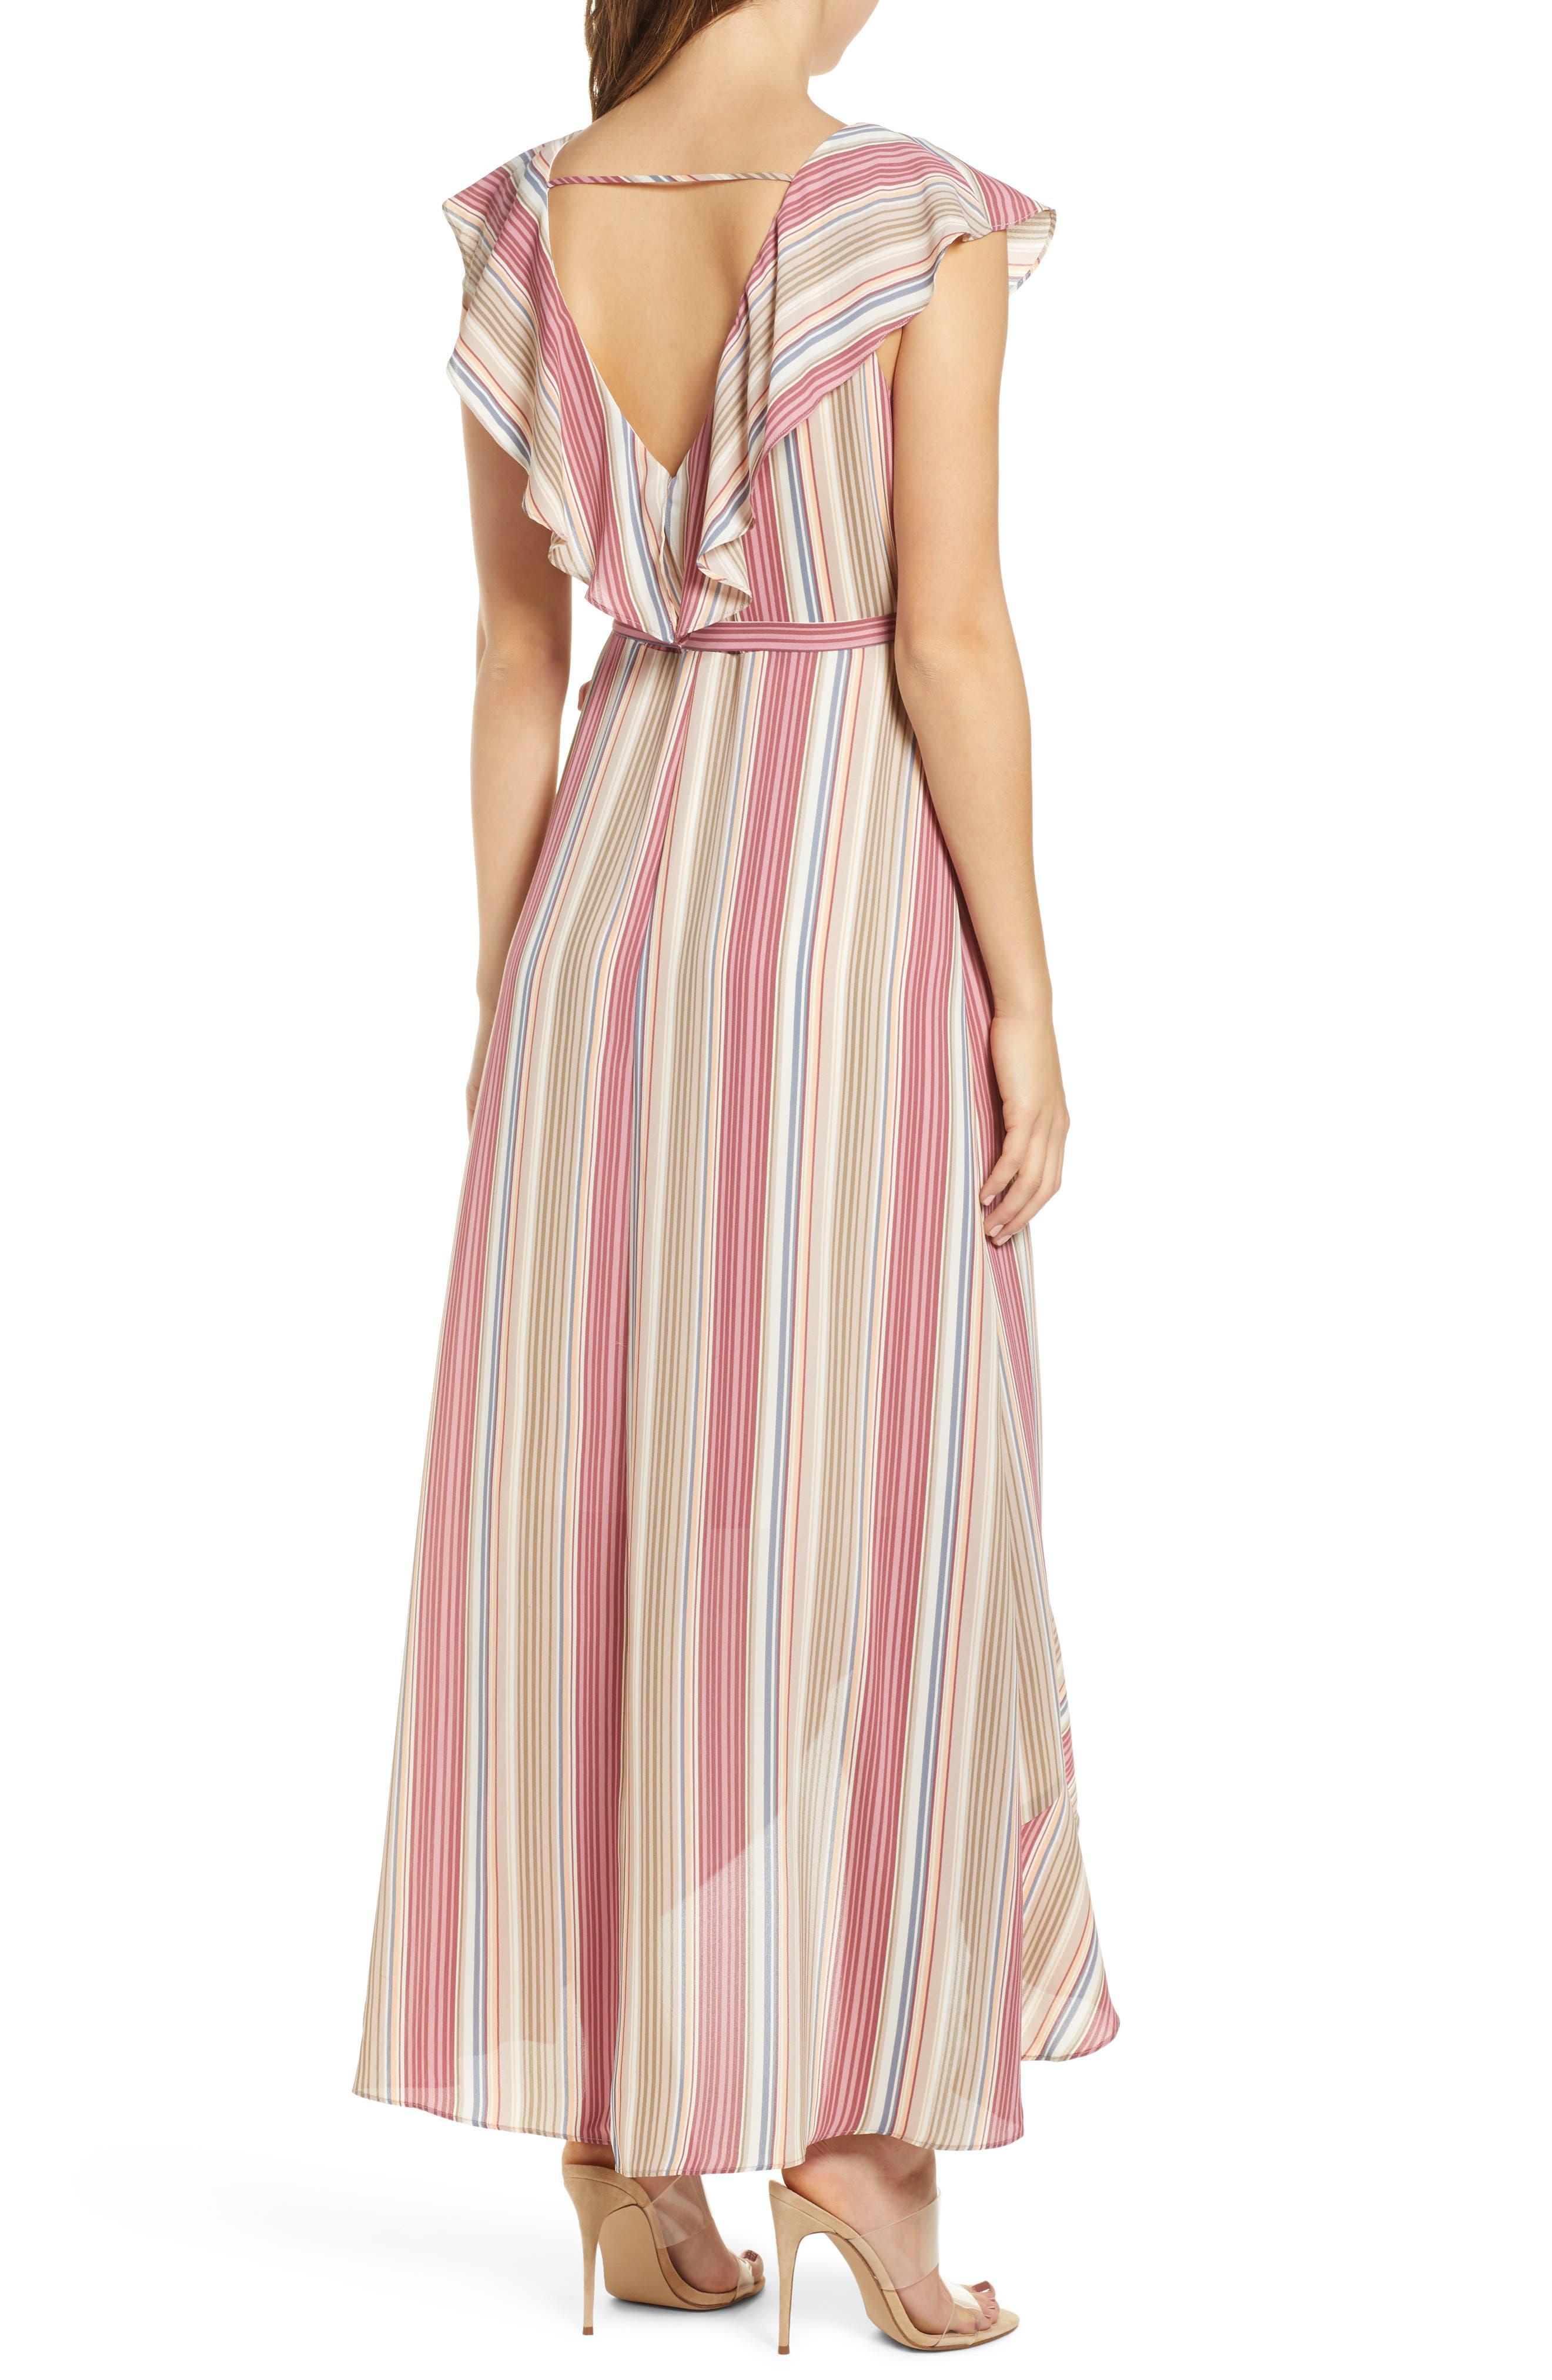 LEITH, Ruffle Wrap Maxi Dress, Alternate thumbnail 2, color, PINK CANYON TONAL STRIPE